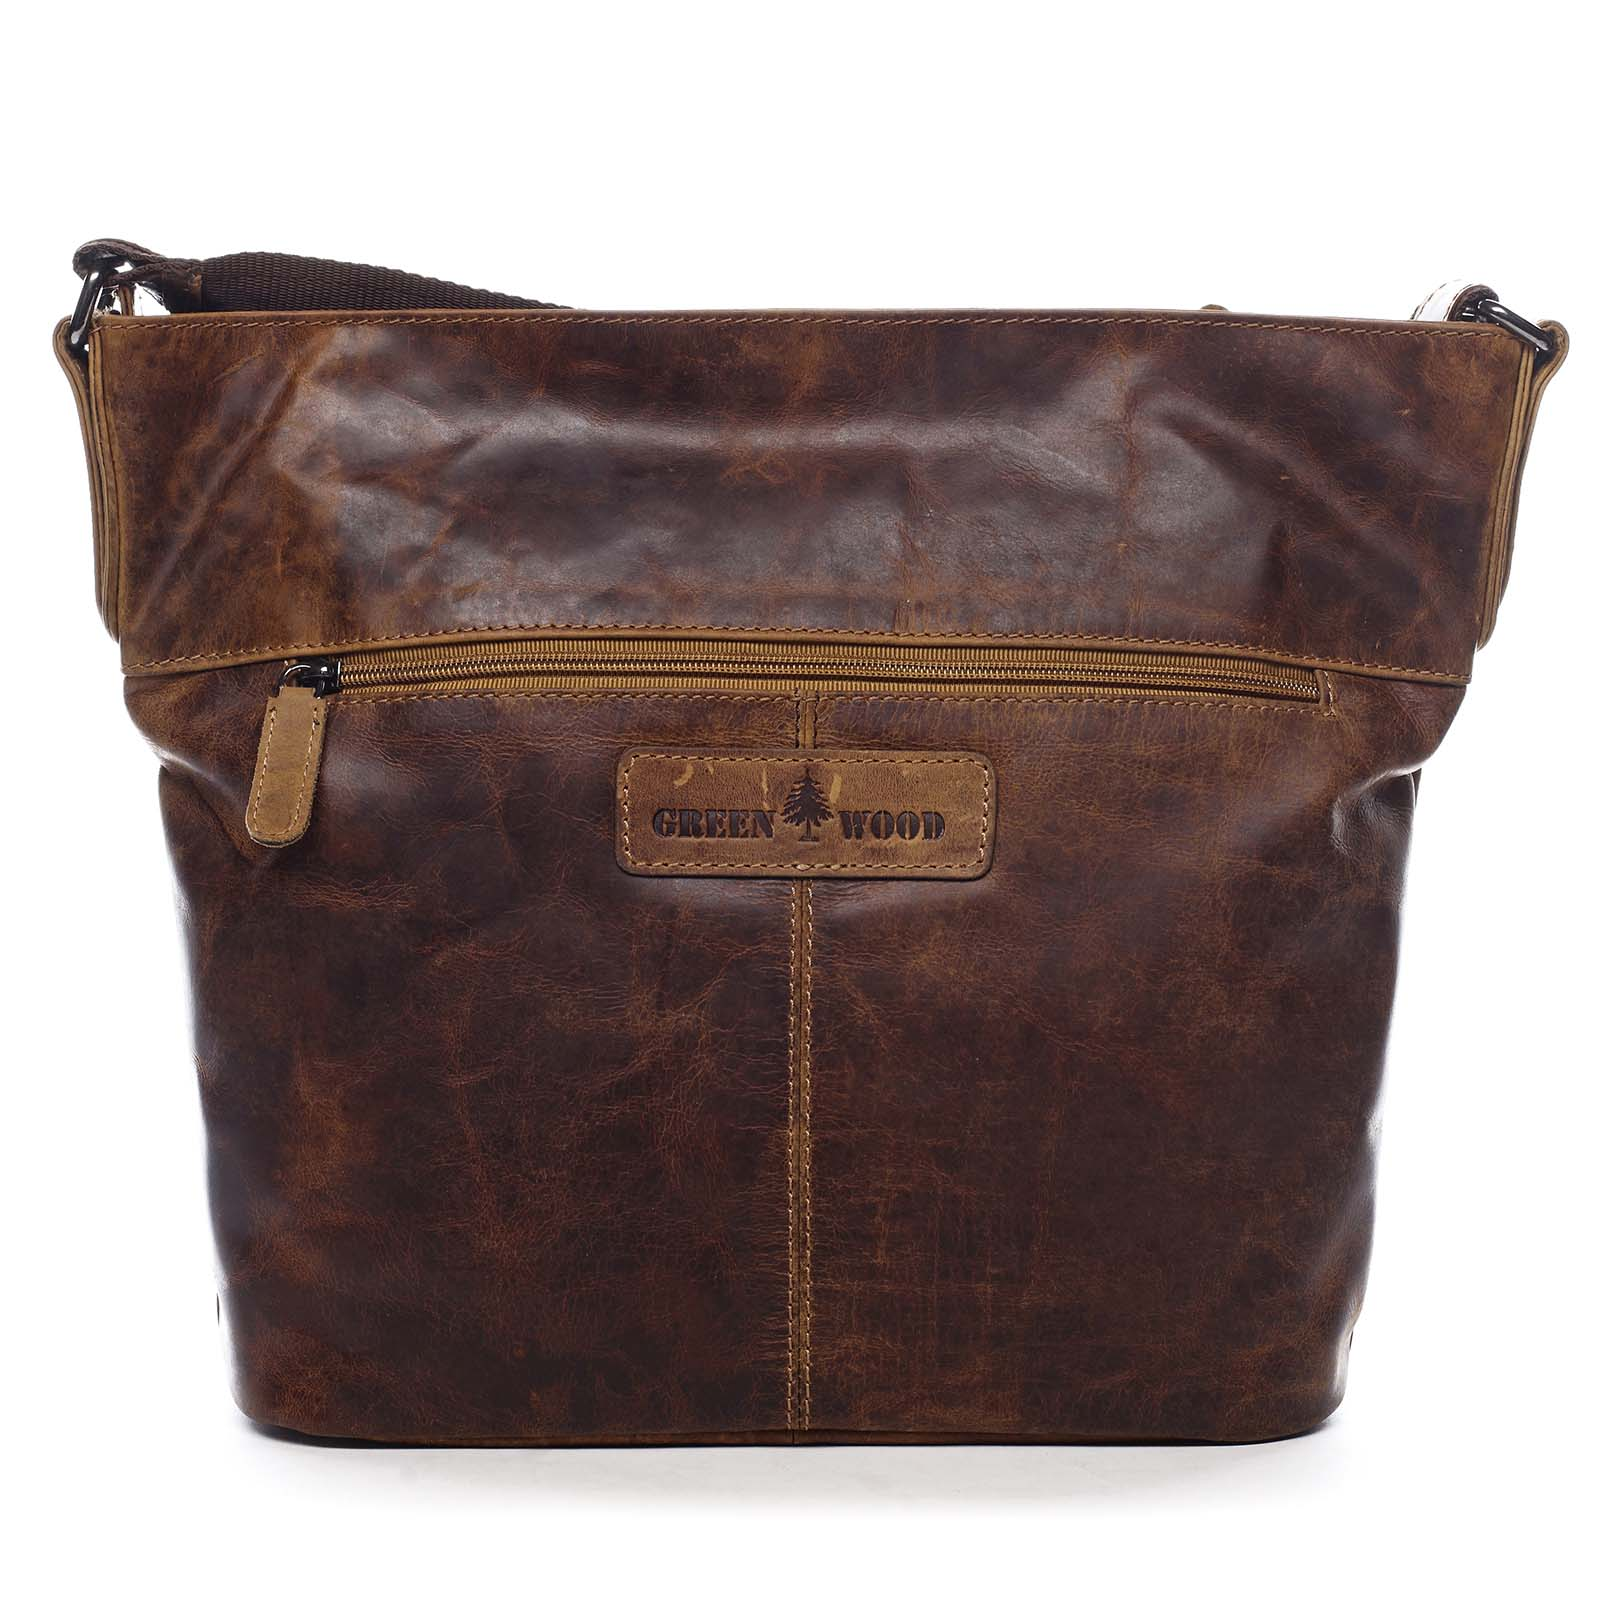 Dámska kožená kabelka cez rameno hnedá - Greenwood Fluxis hnedá